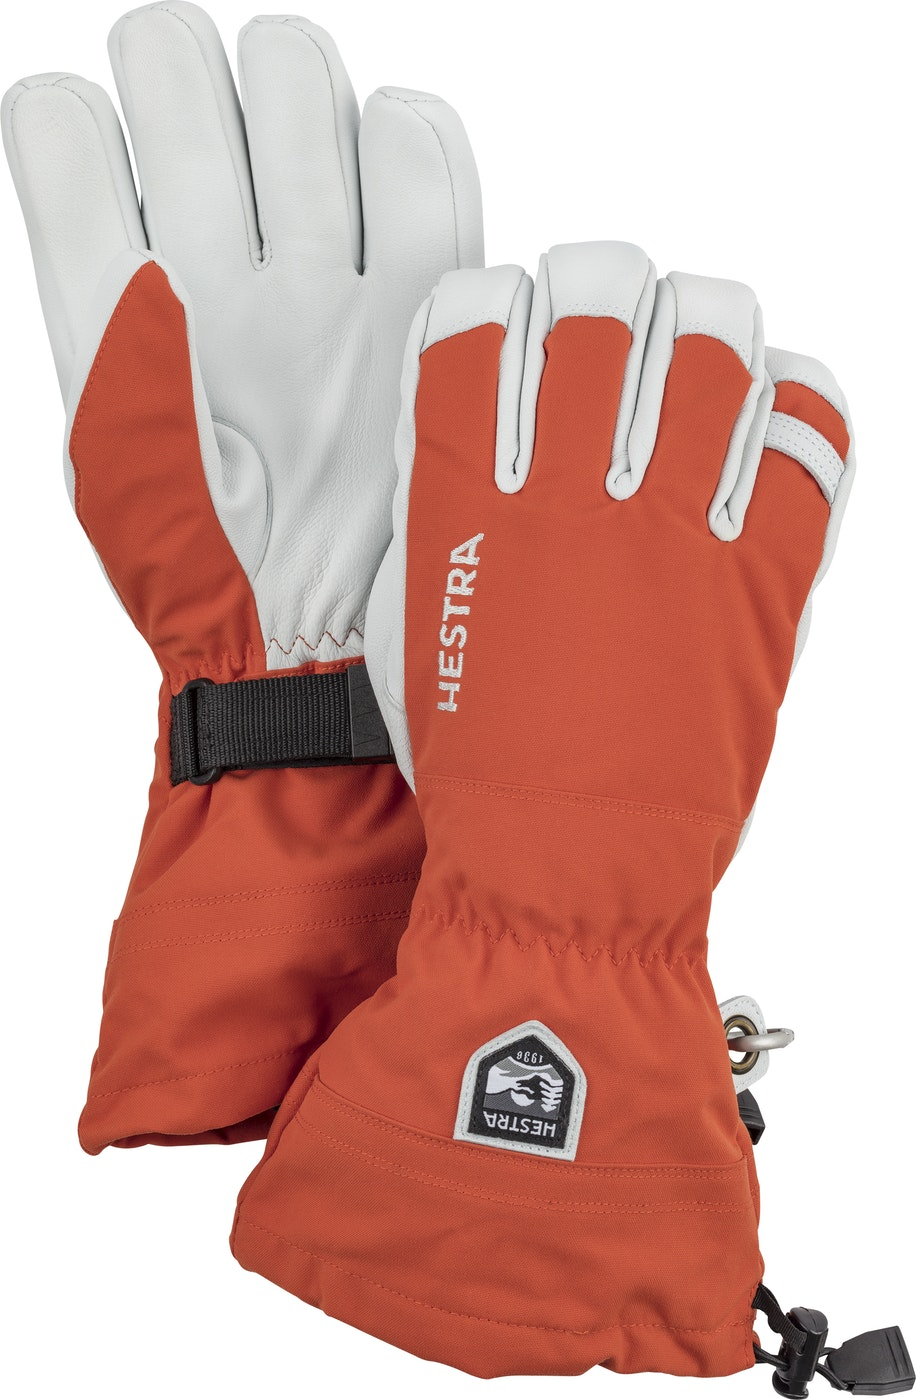 Produktbild för 30570 Army Leather Heli Ski